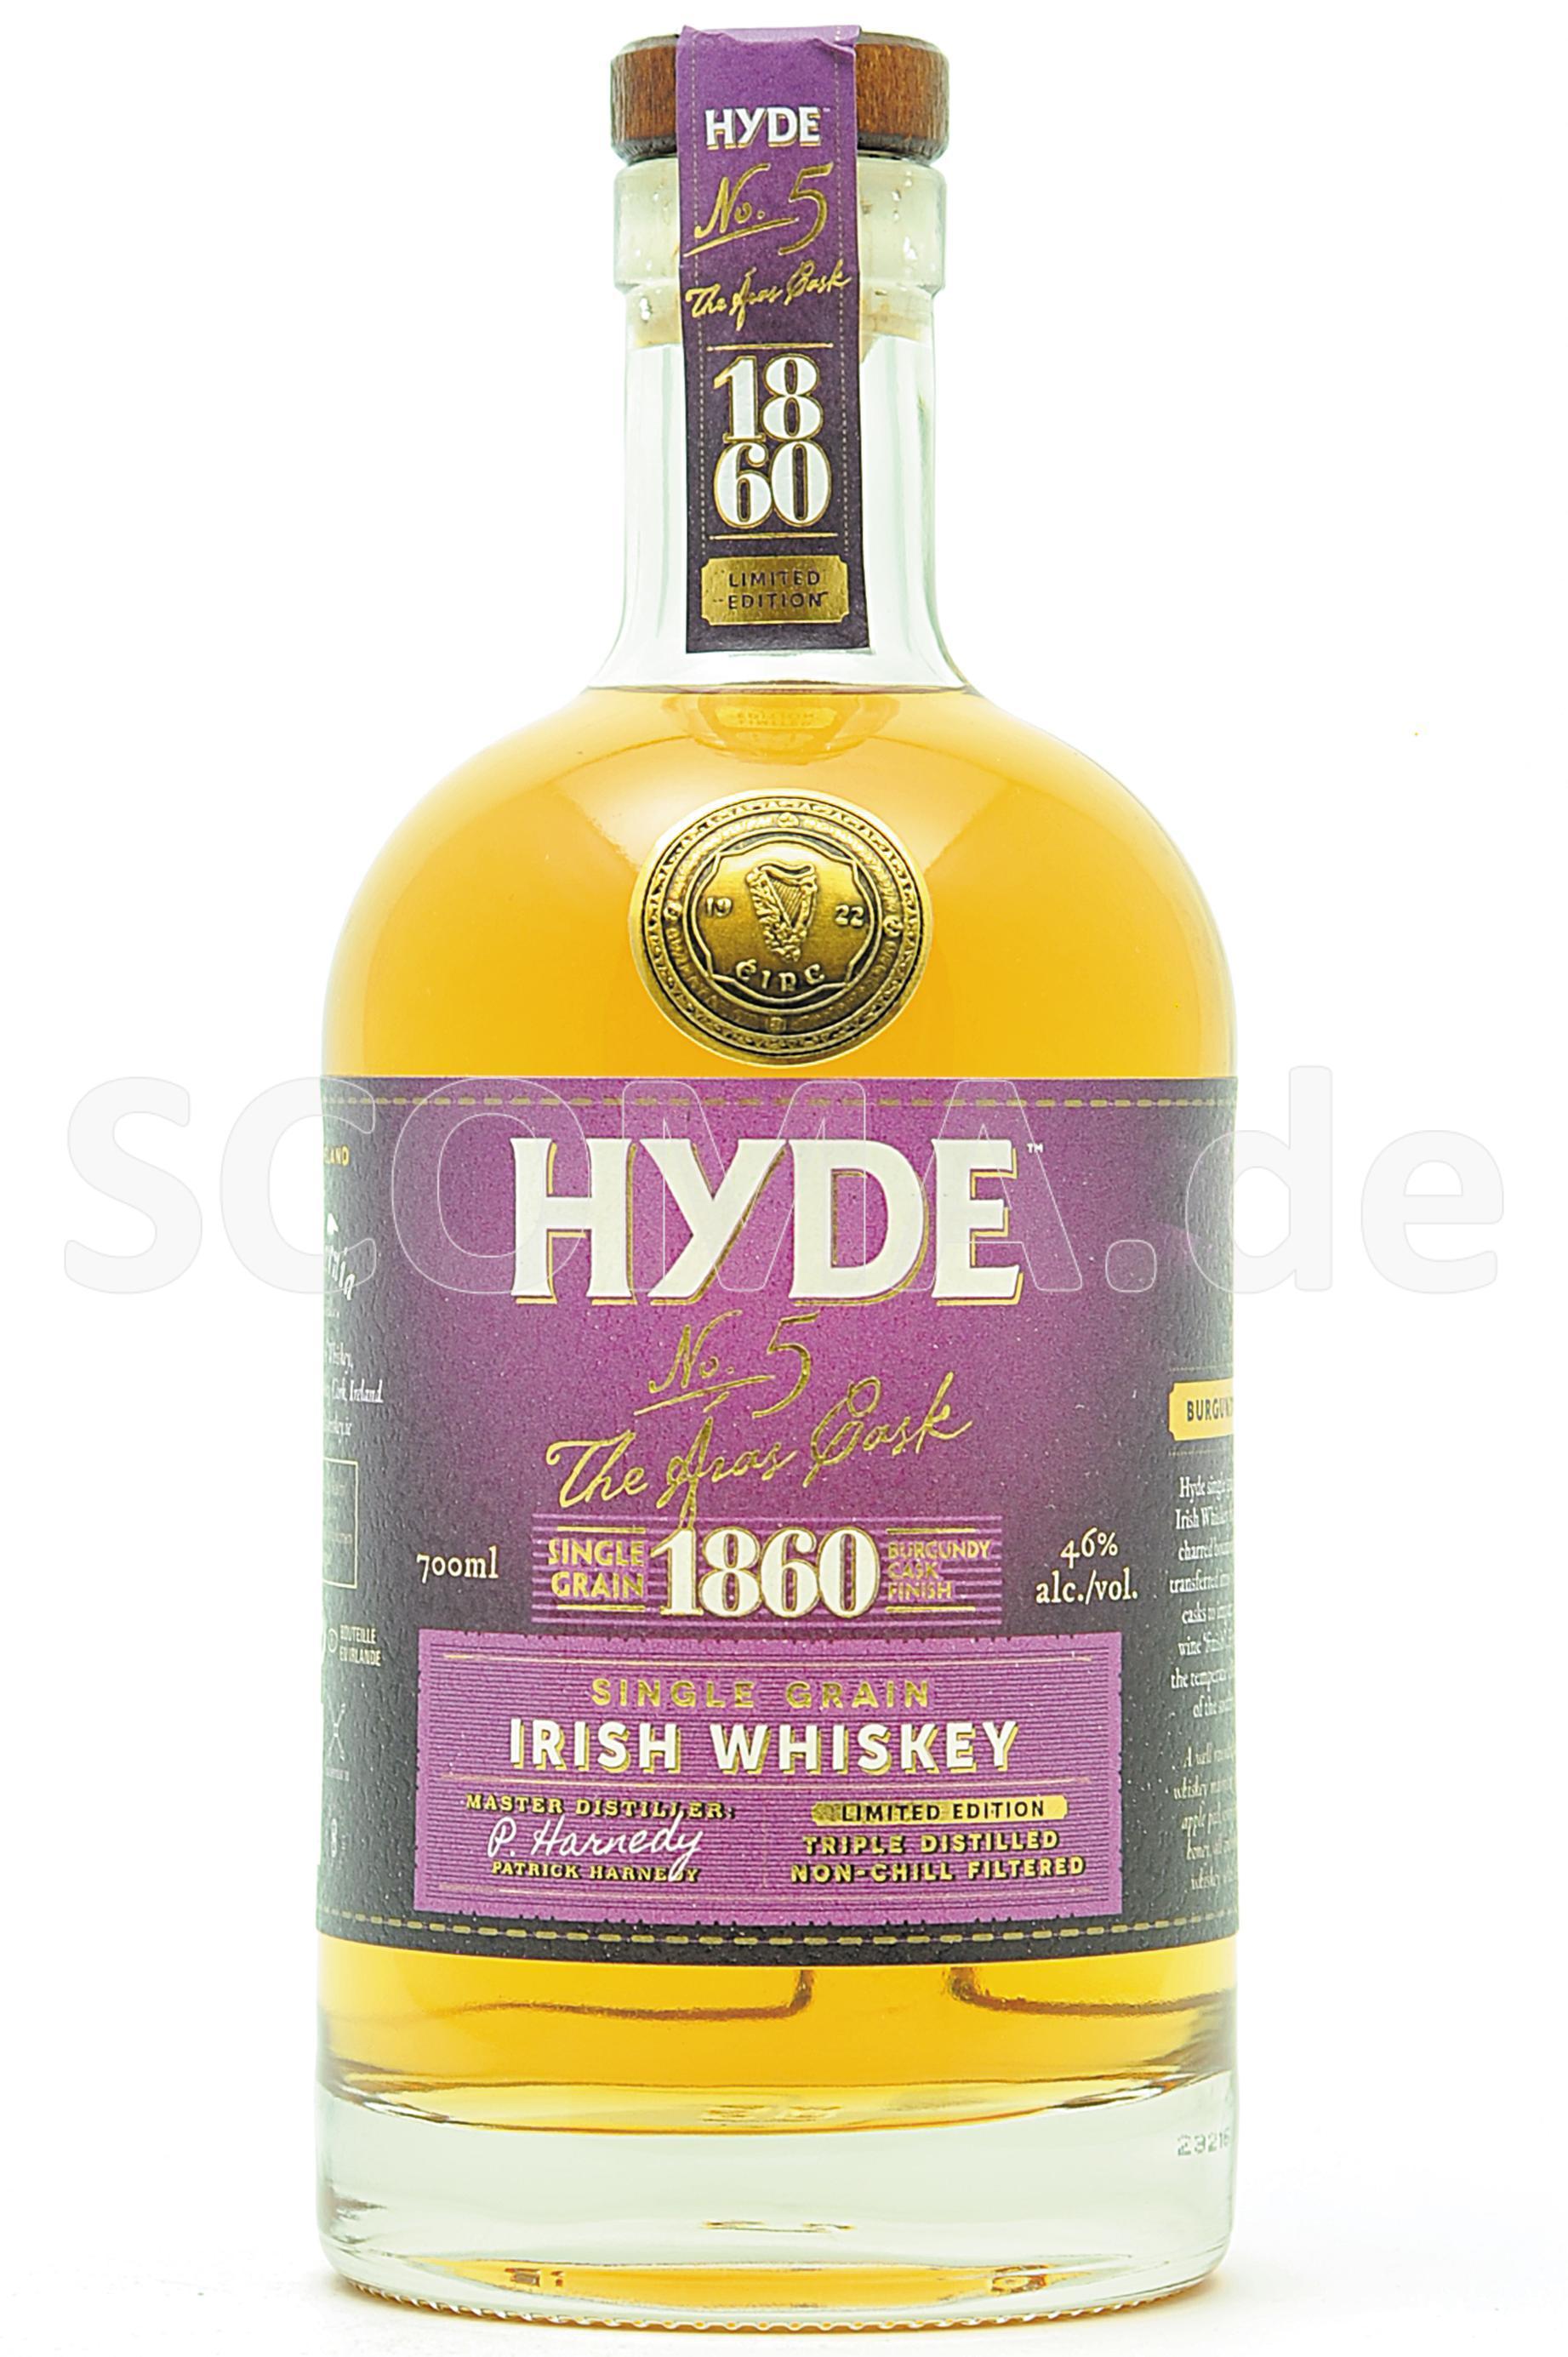 Hyde No. 5 - Single Grain Whis...